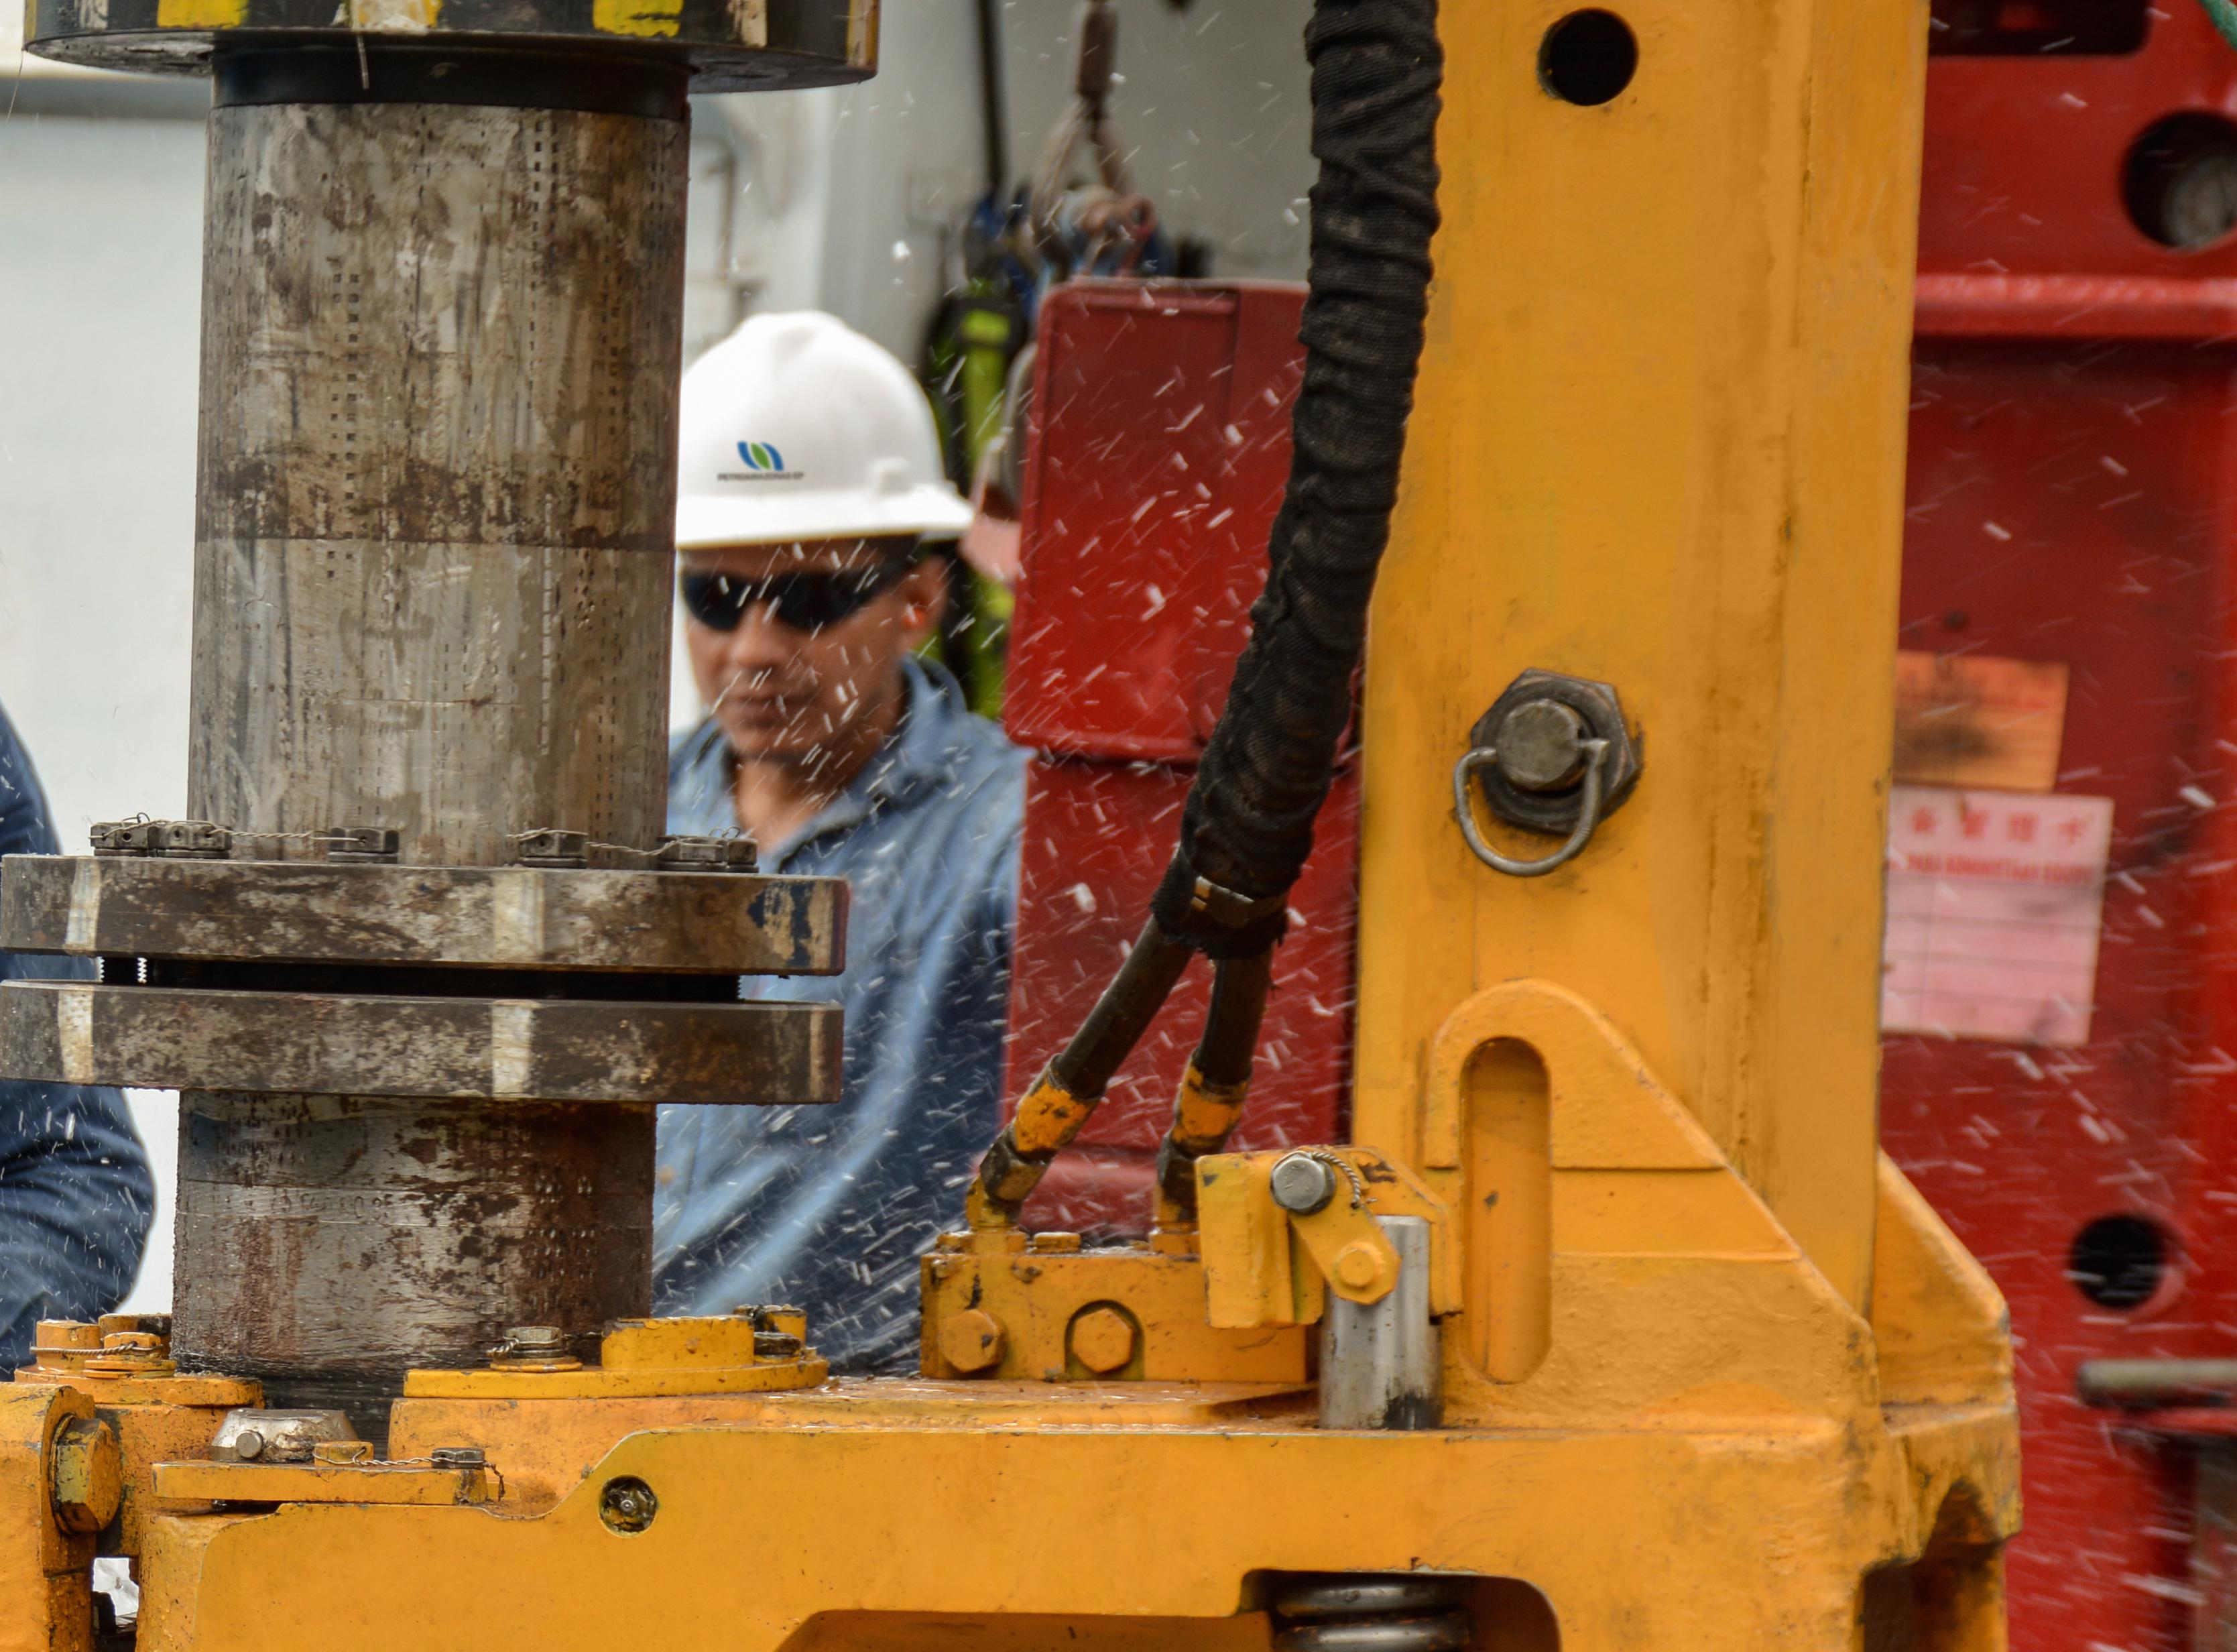 Proveedores mineros aumentarán aporte al PIB peruano